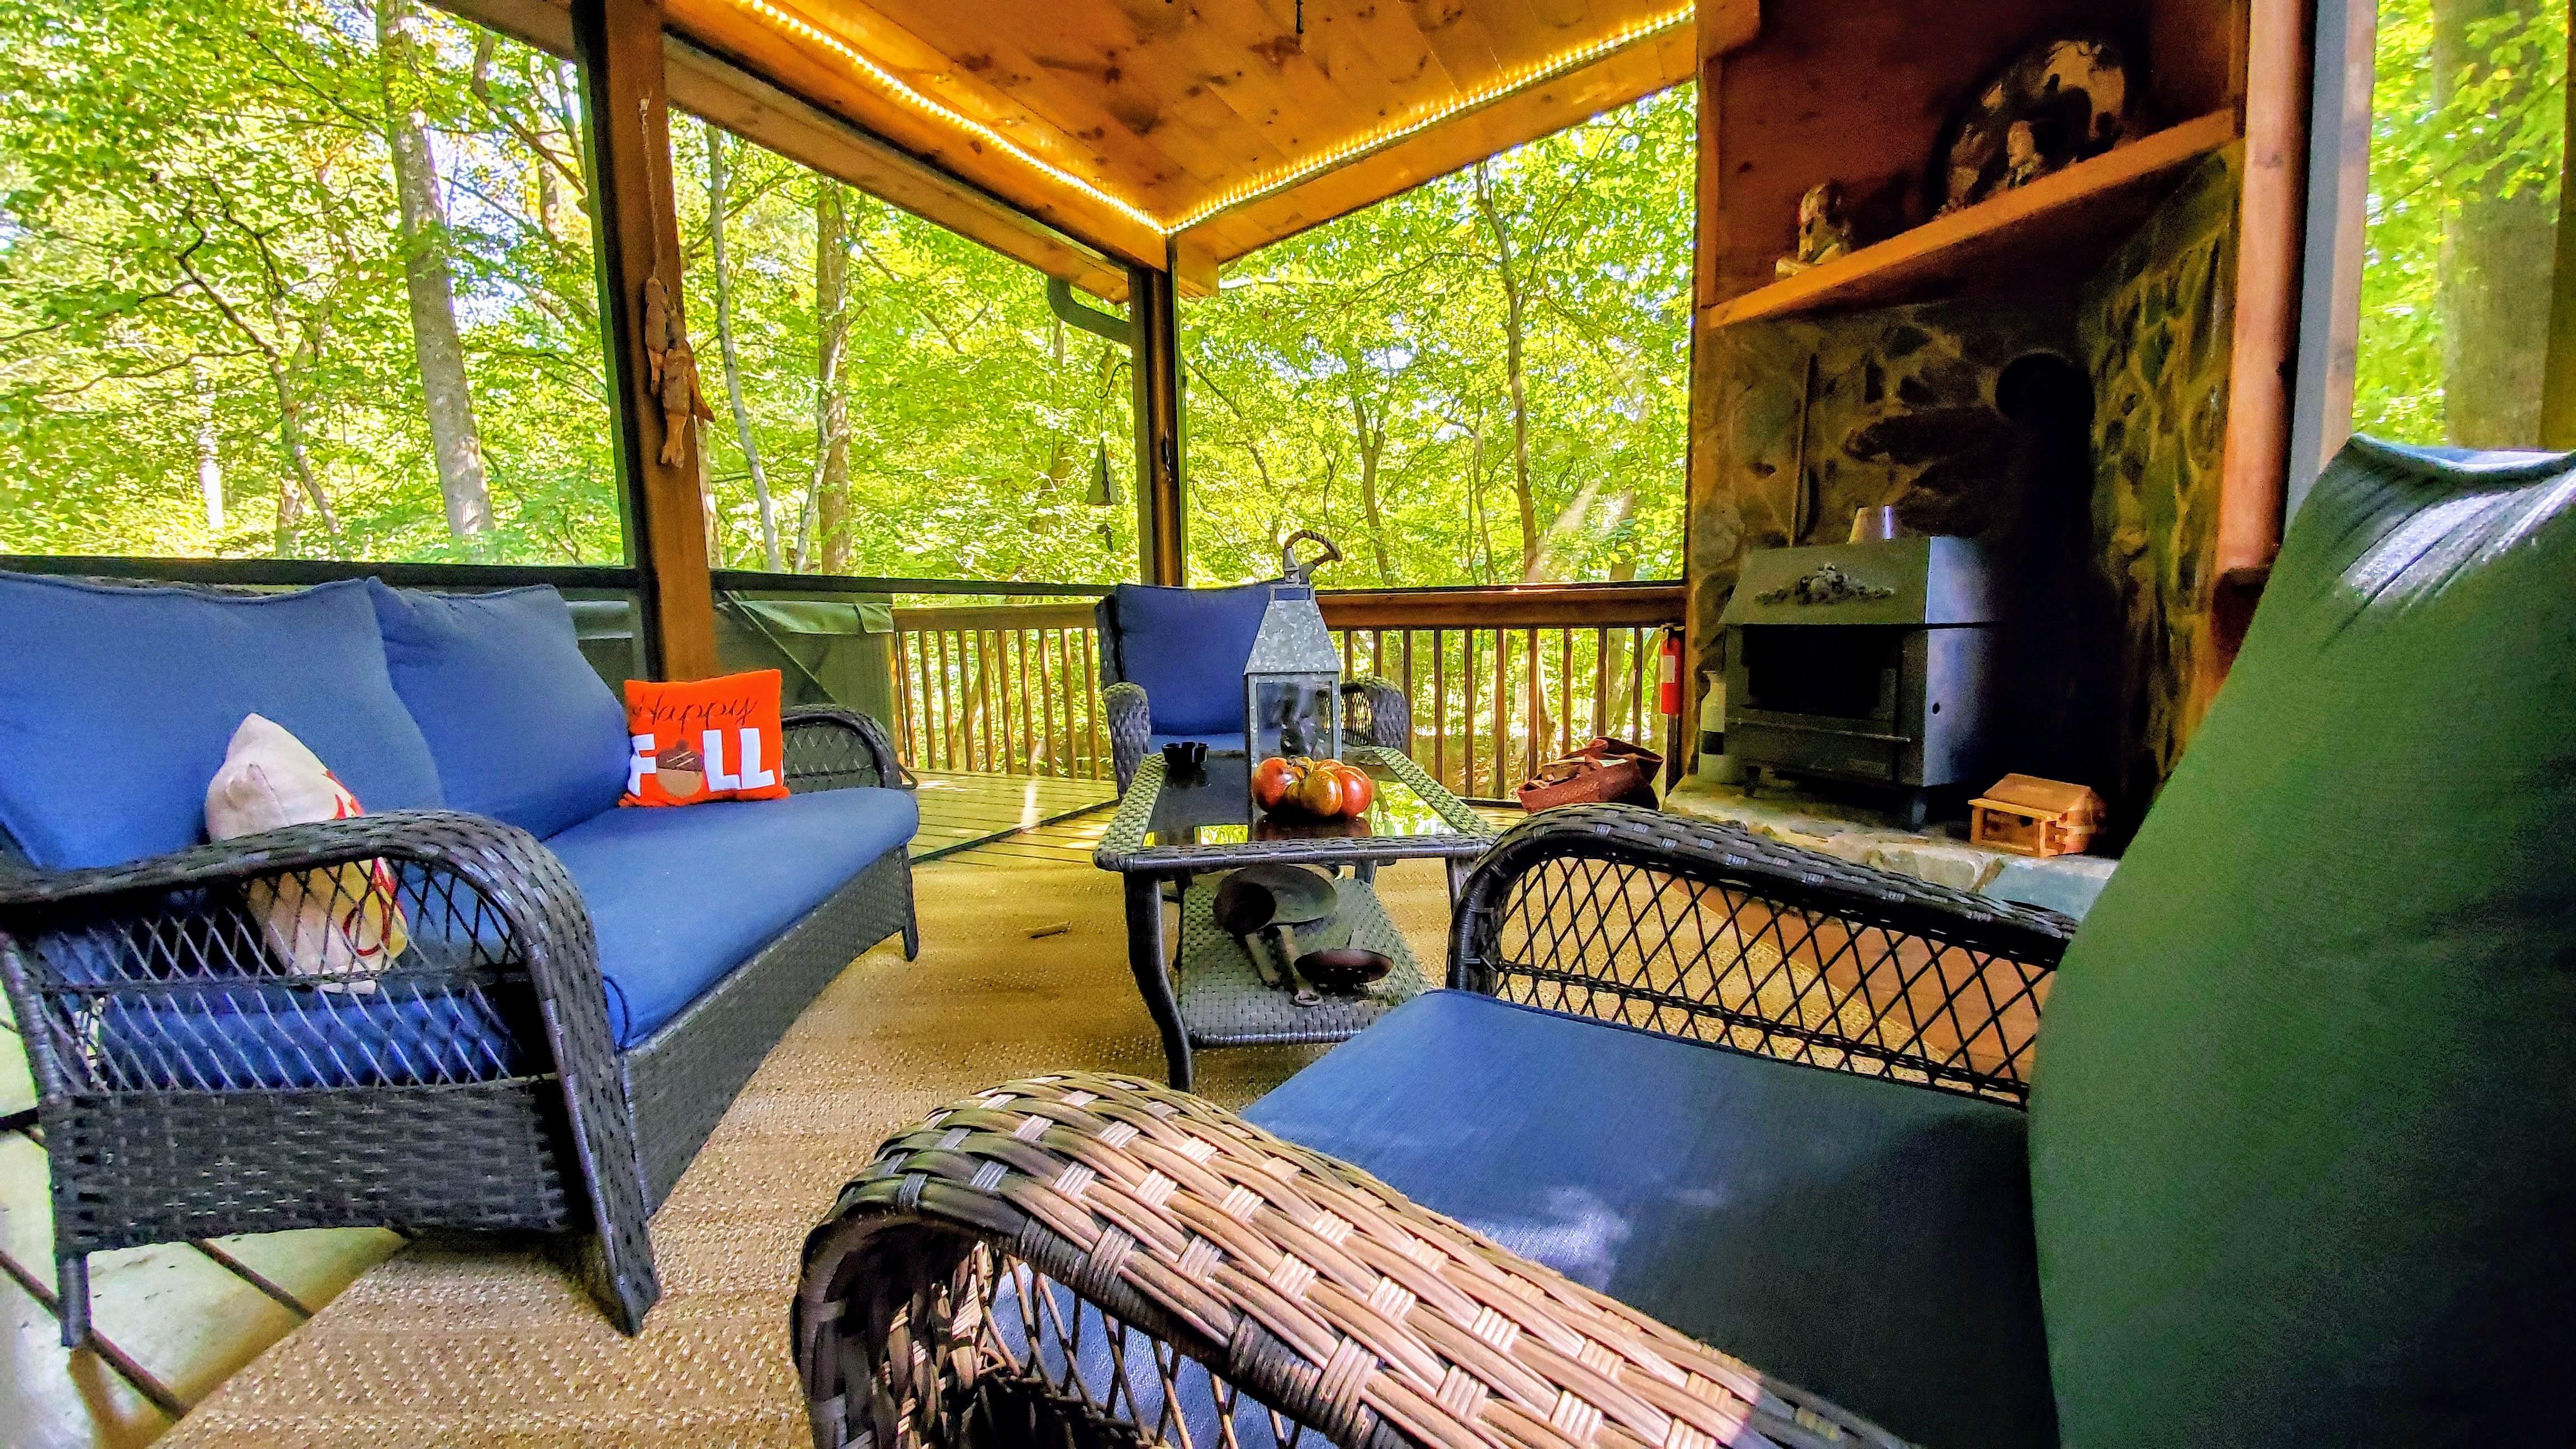 Bach S Creekside Retreat Celebrate Blue Ridge Cabin Rentals